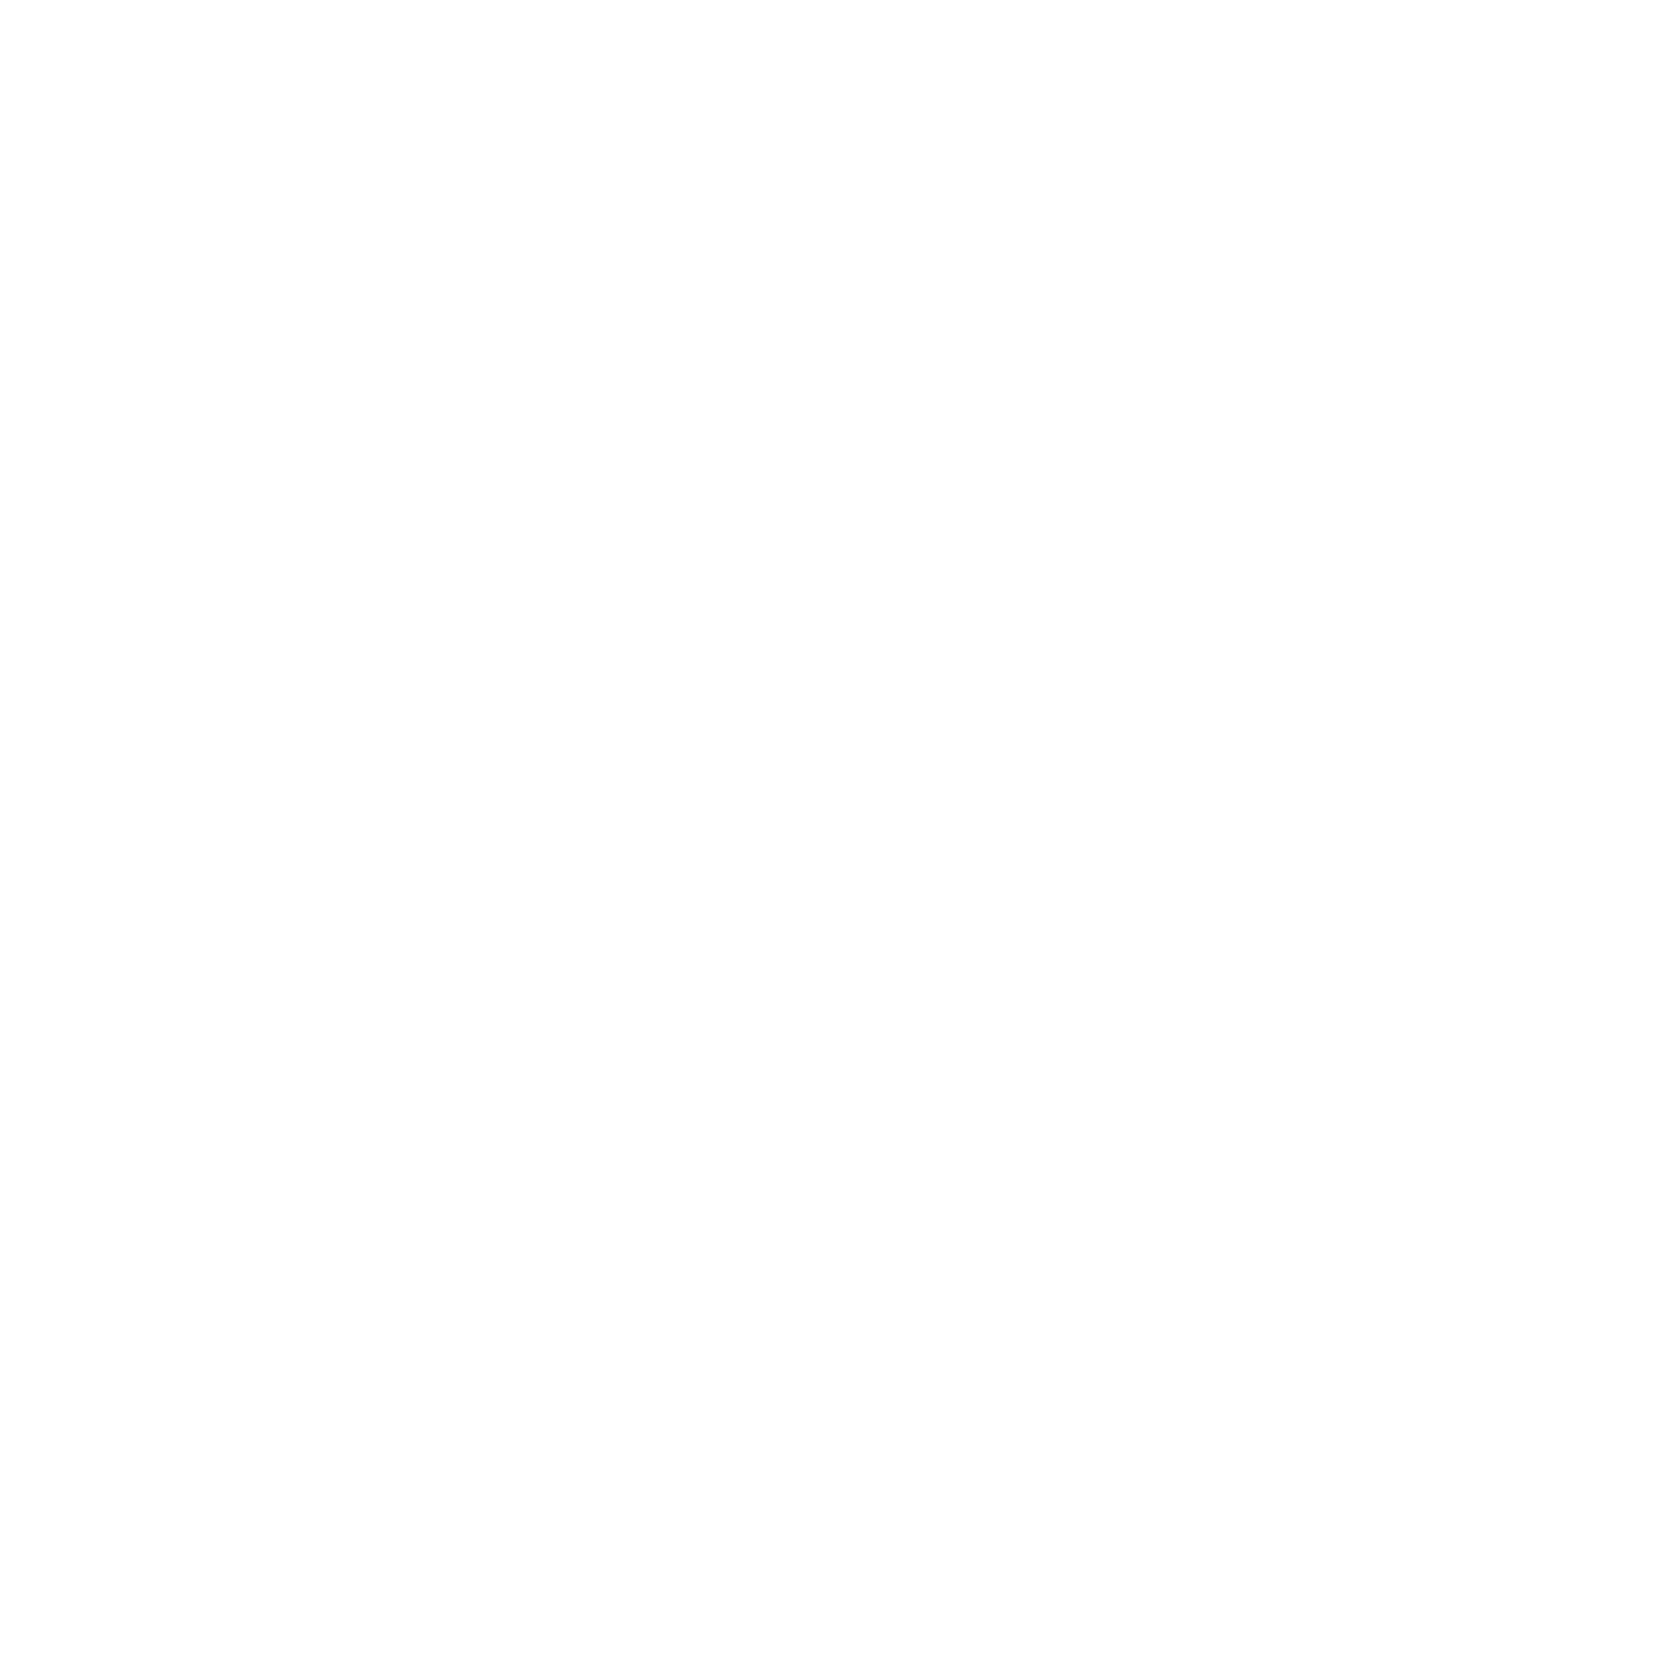 Dual studio